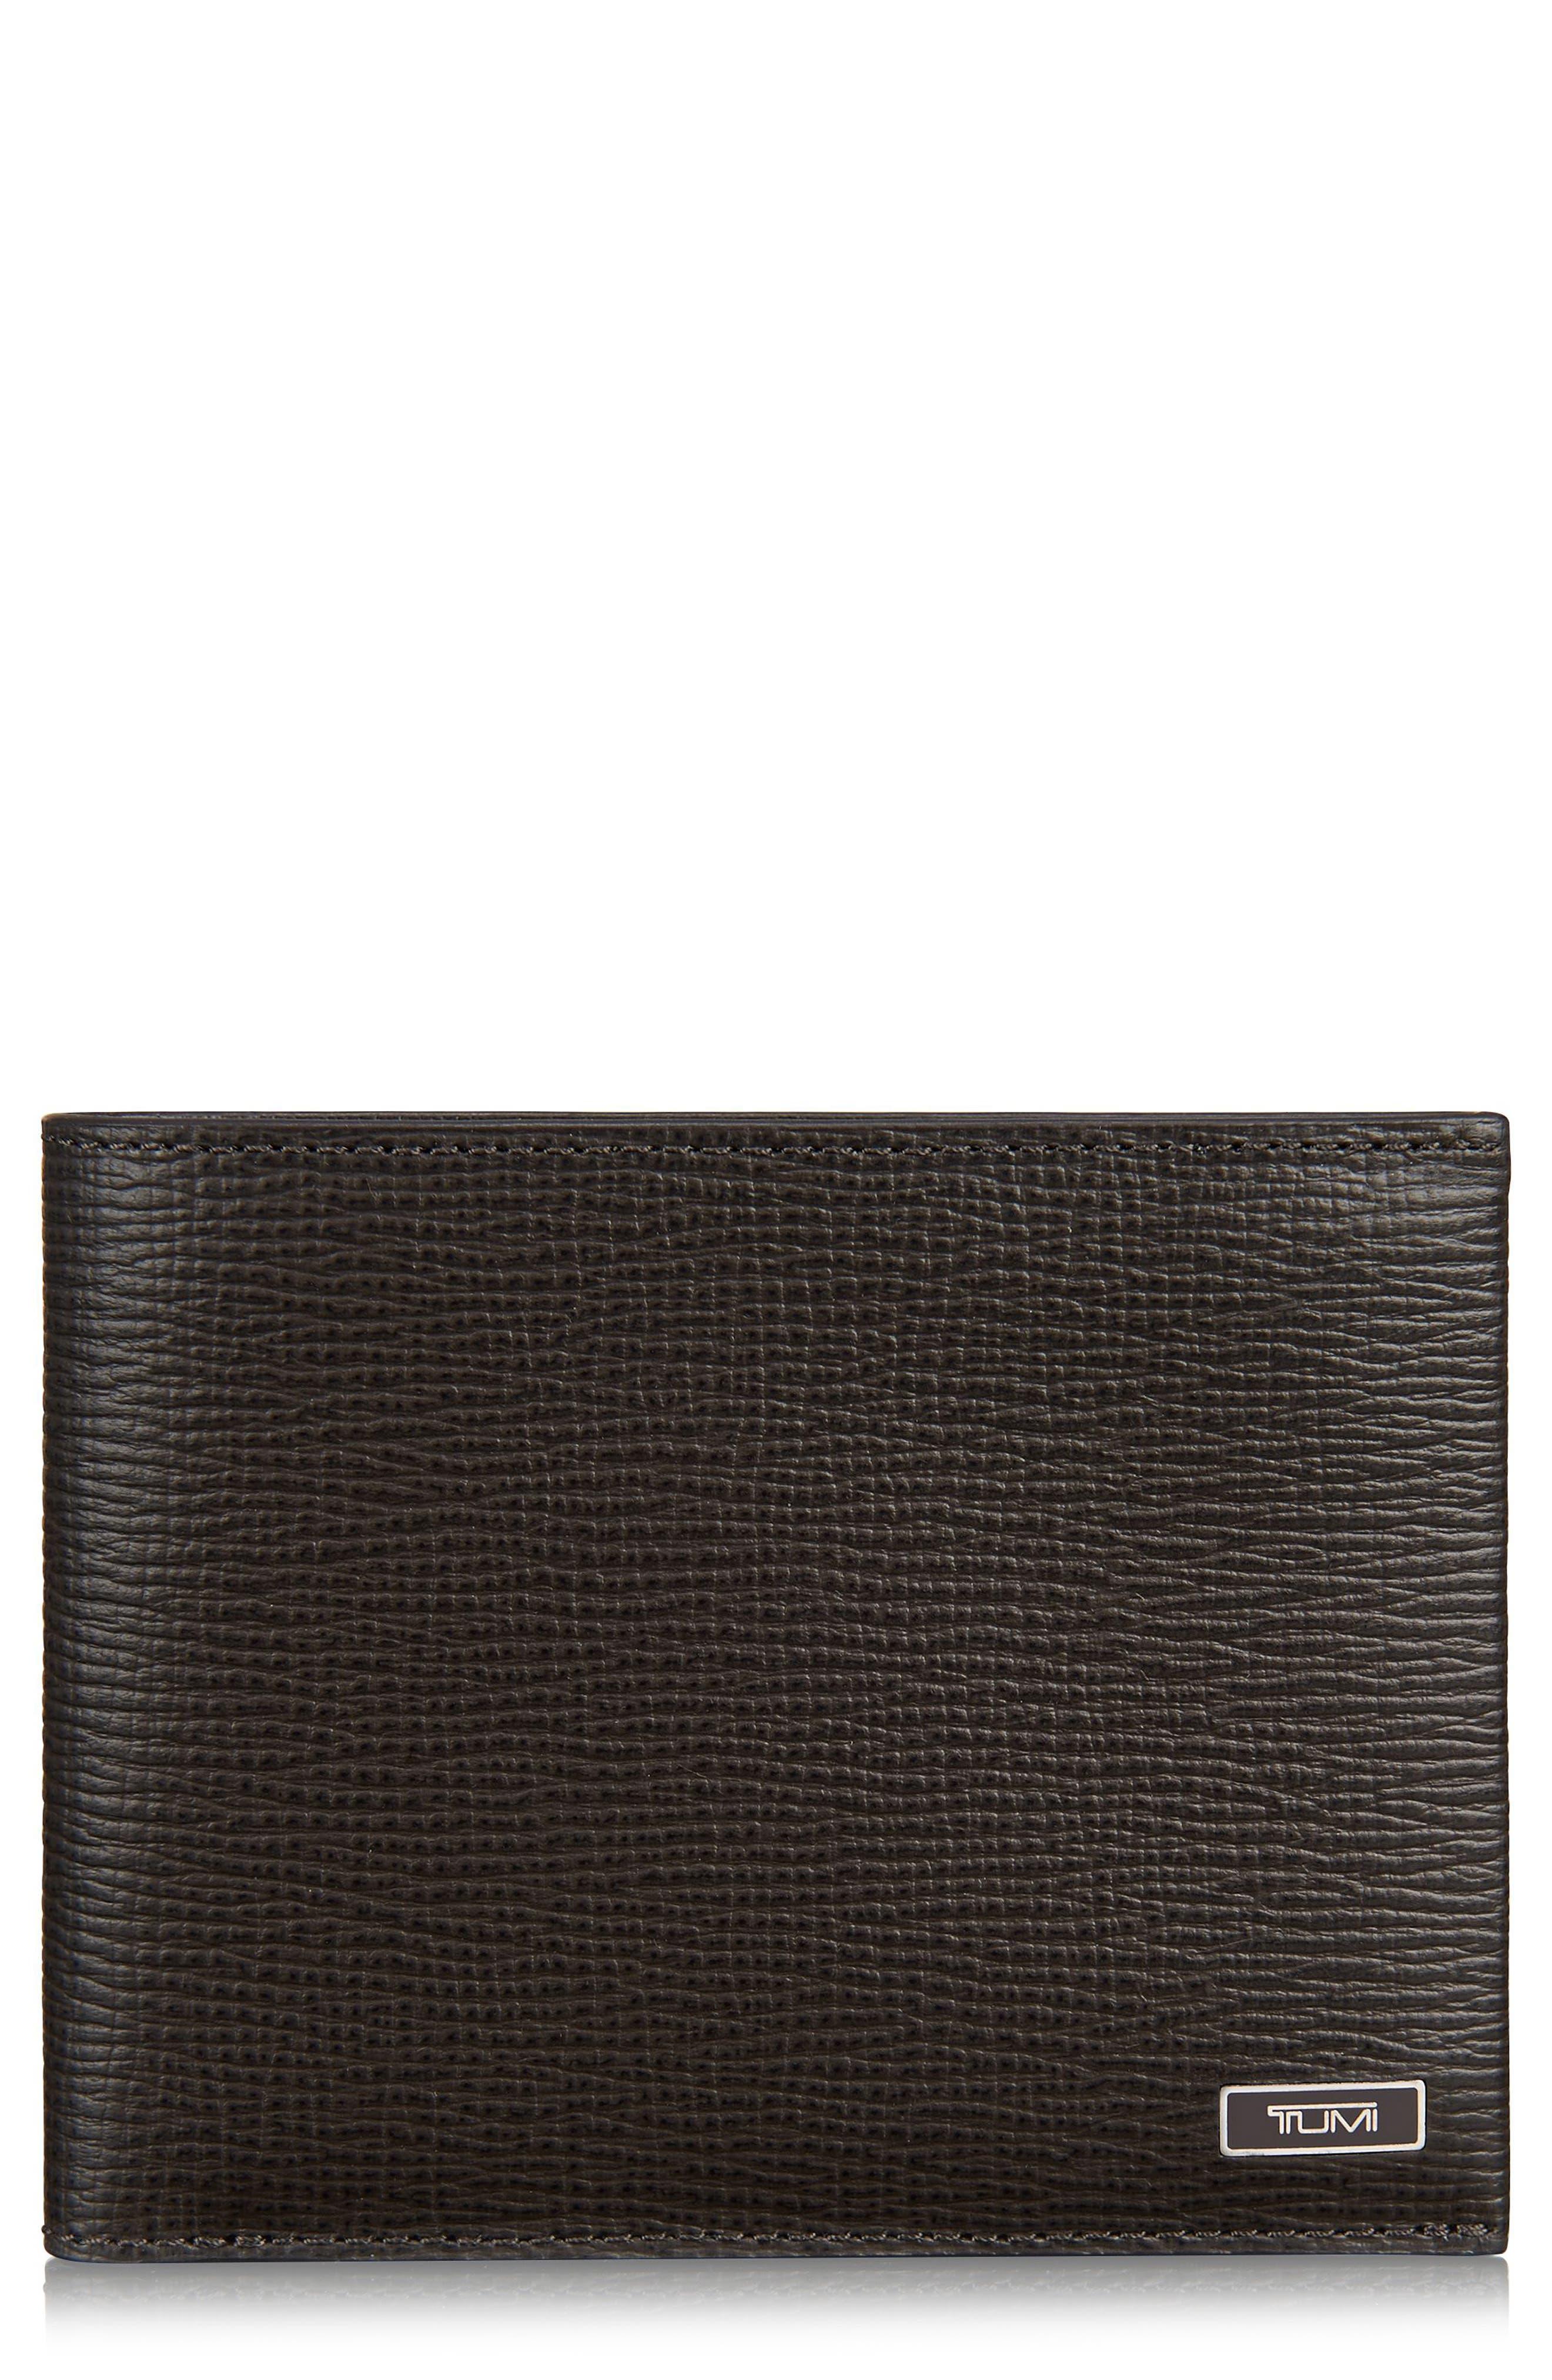 Monaco Leather Wallet,                             Main thumbnail 1, color,